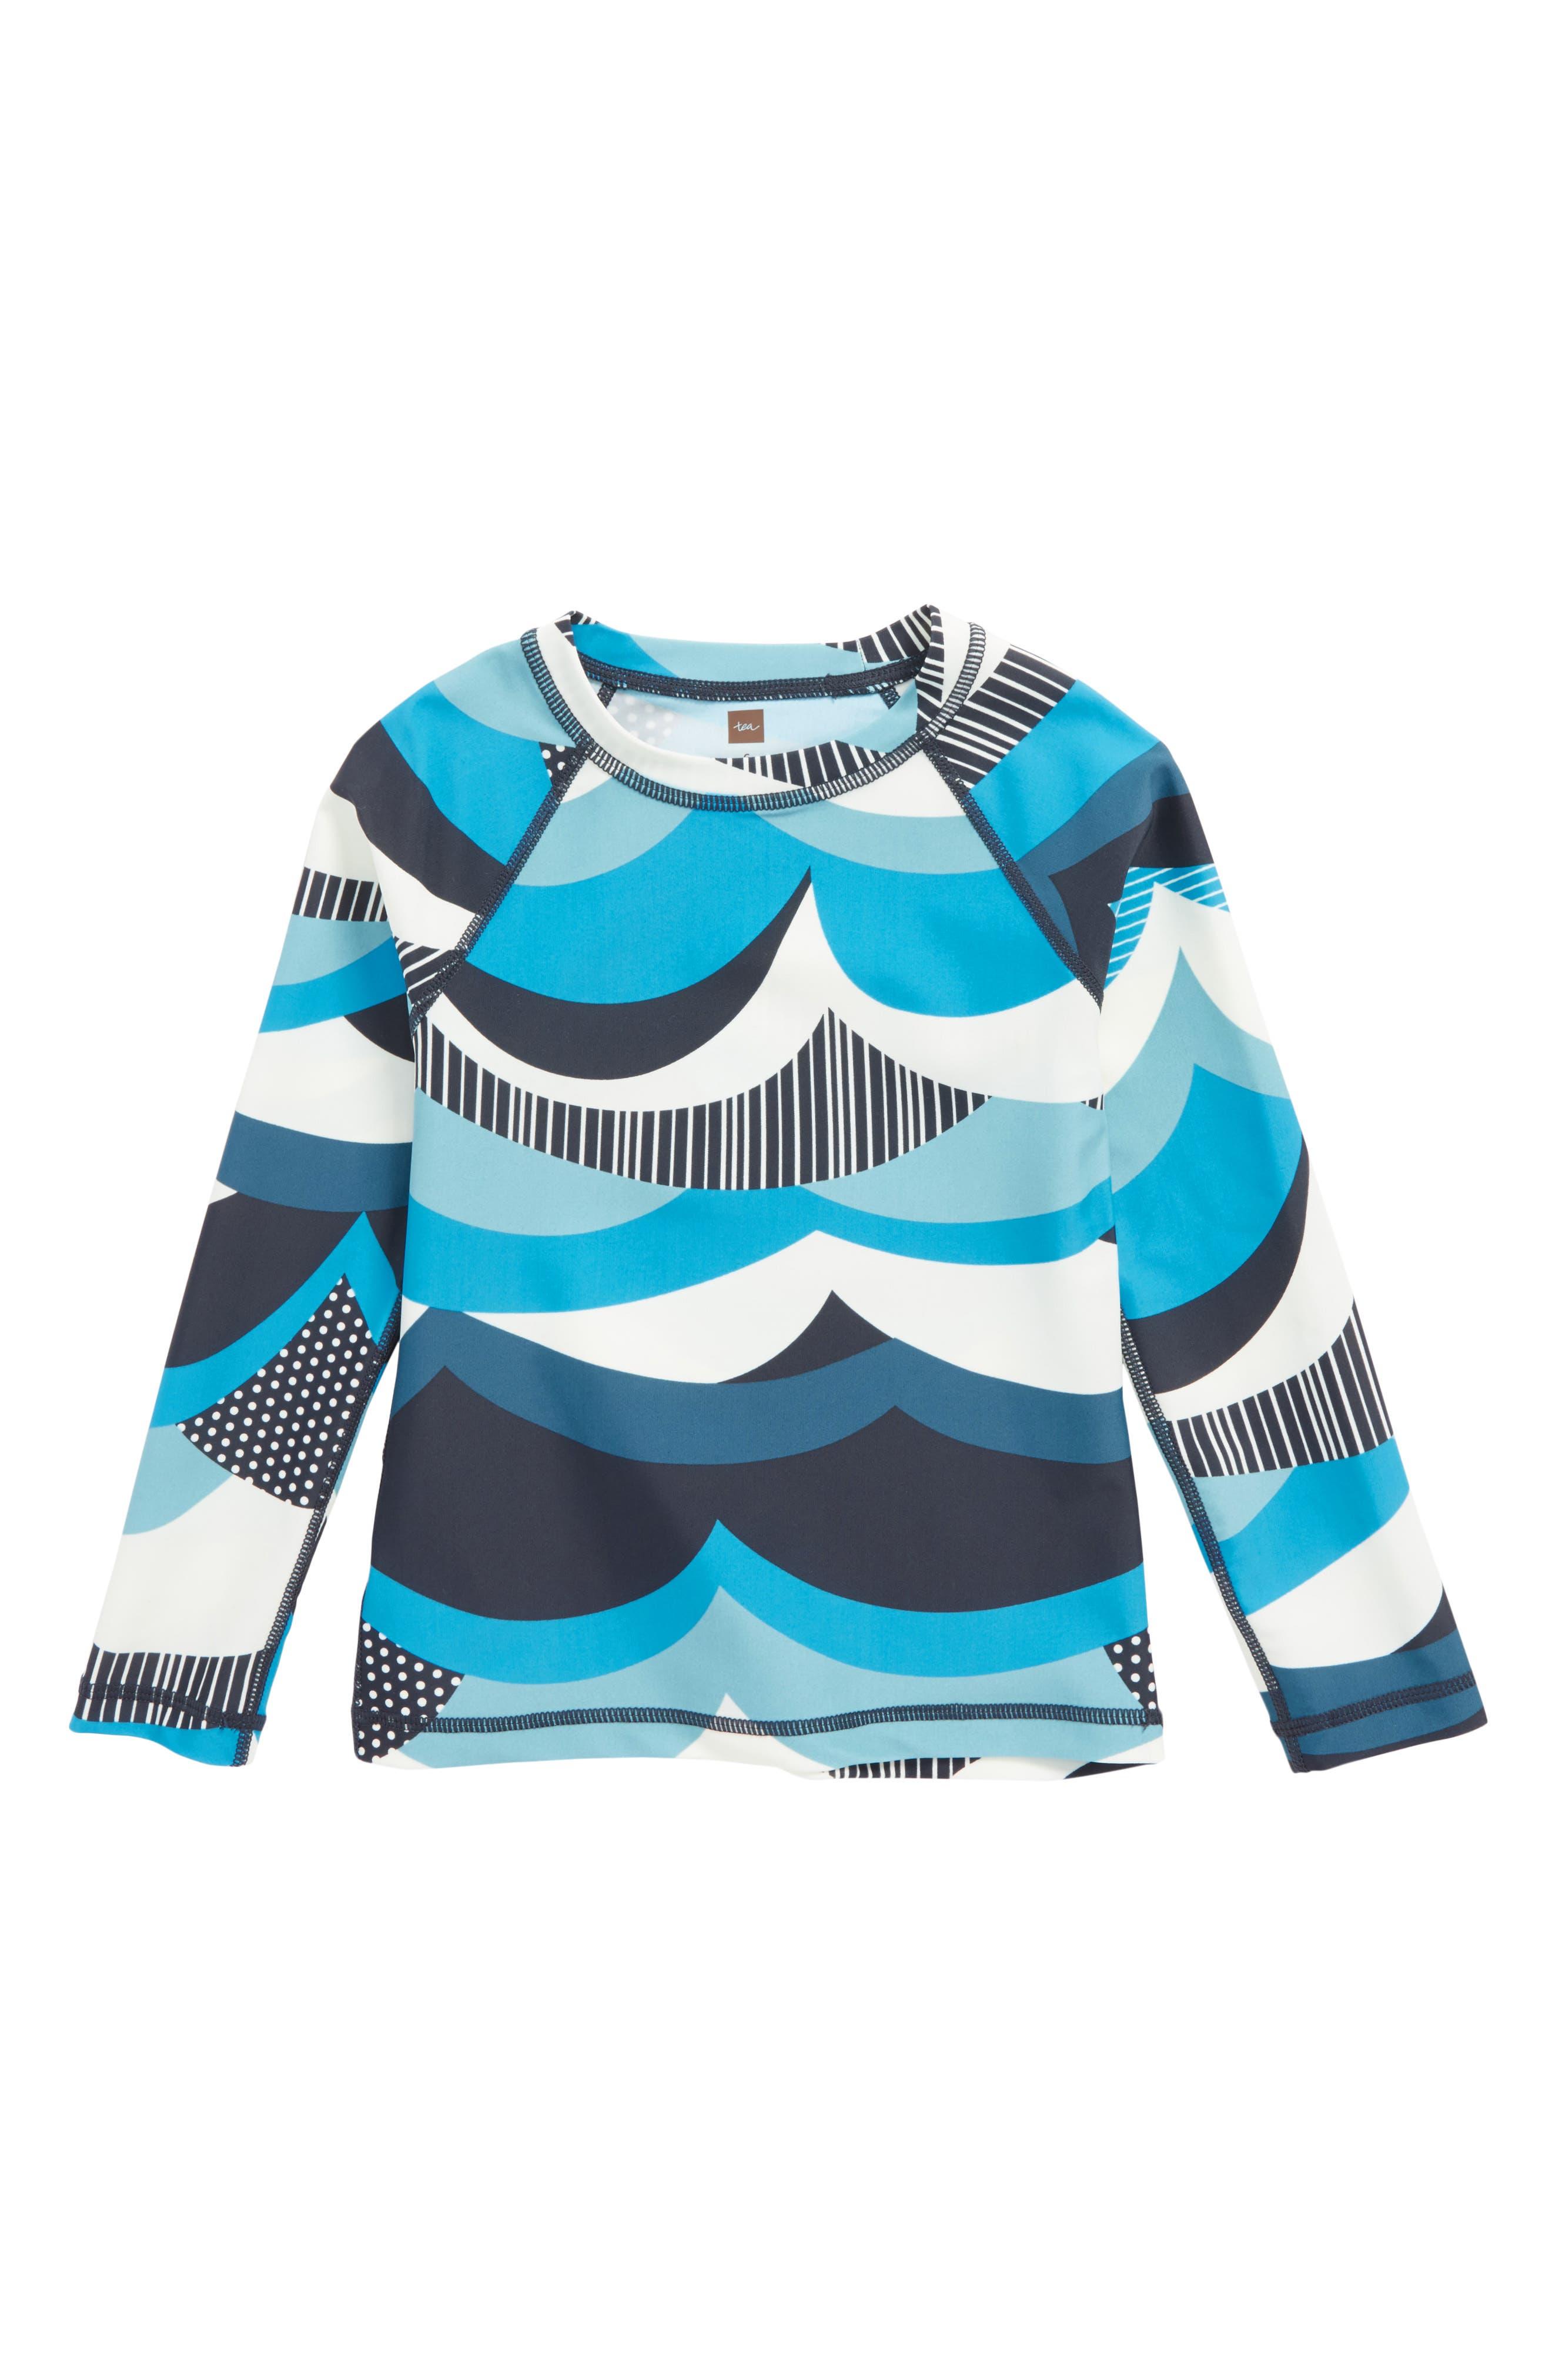 Make Waves Rashguard,                         Main,                         color, 411